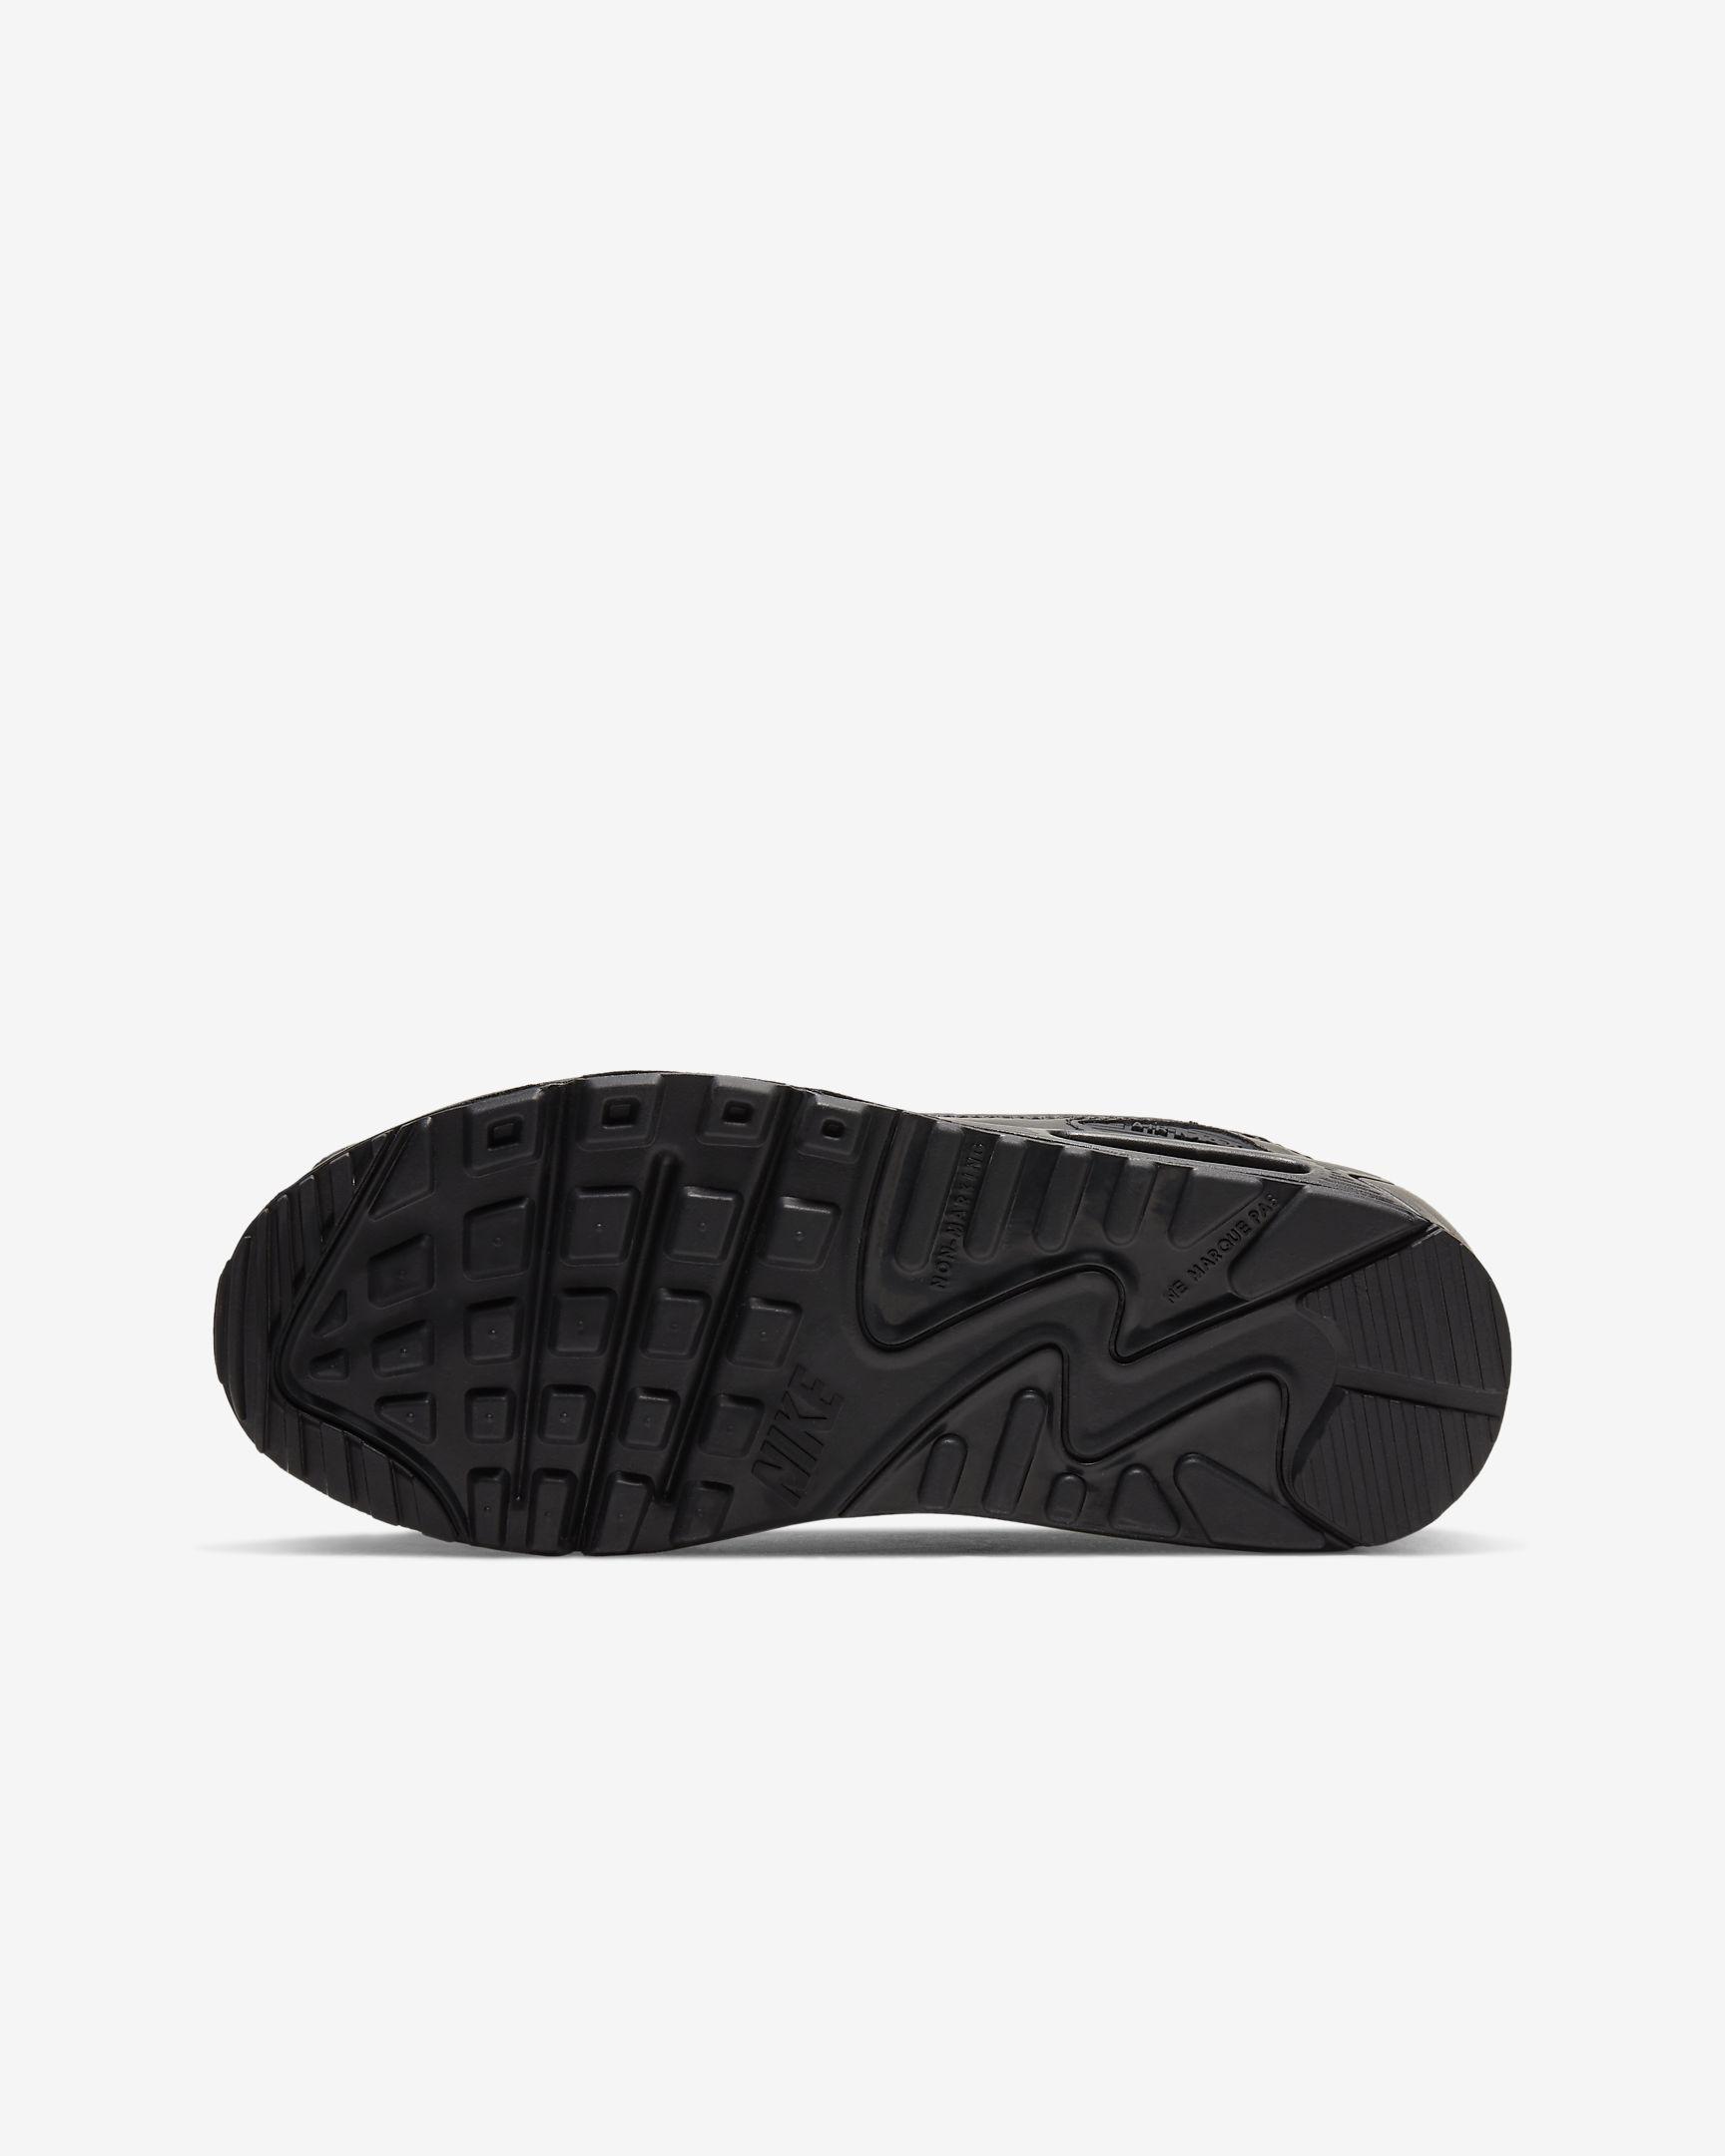 Tenisky Nike Air Max 90 Kožené Čierne-WWW.AIRFORCE.SK